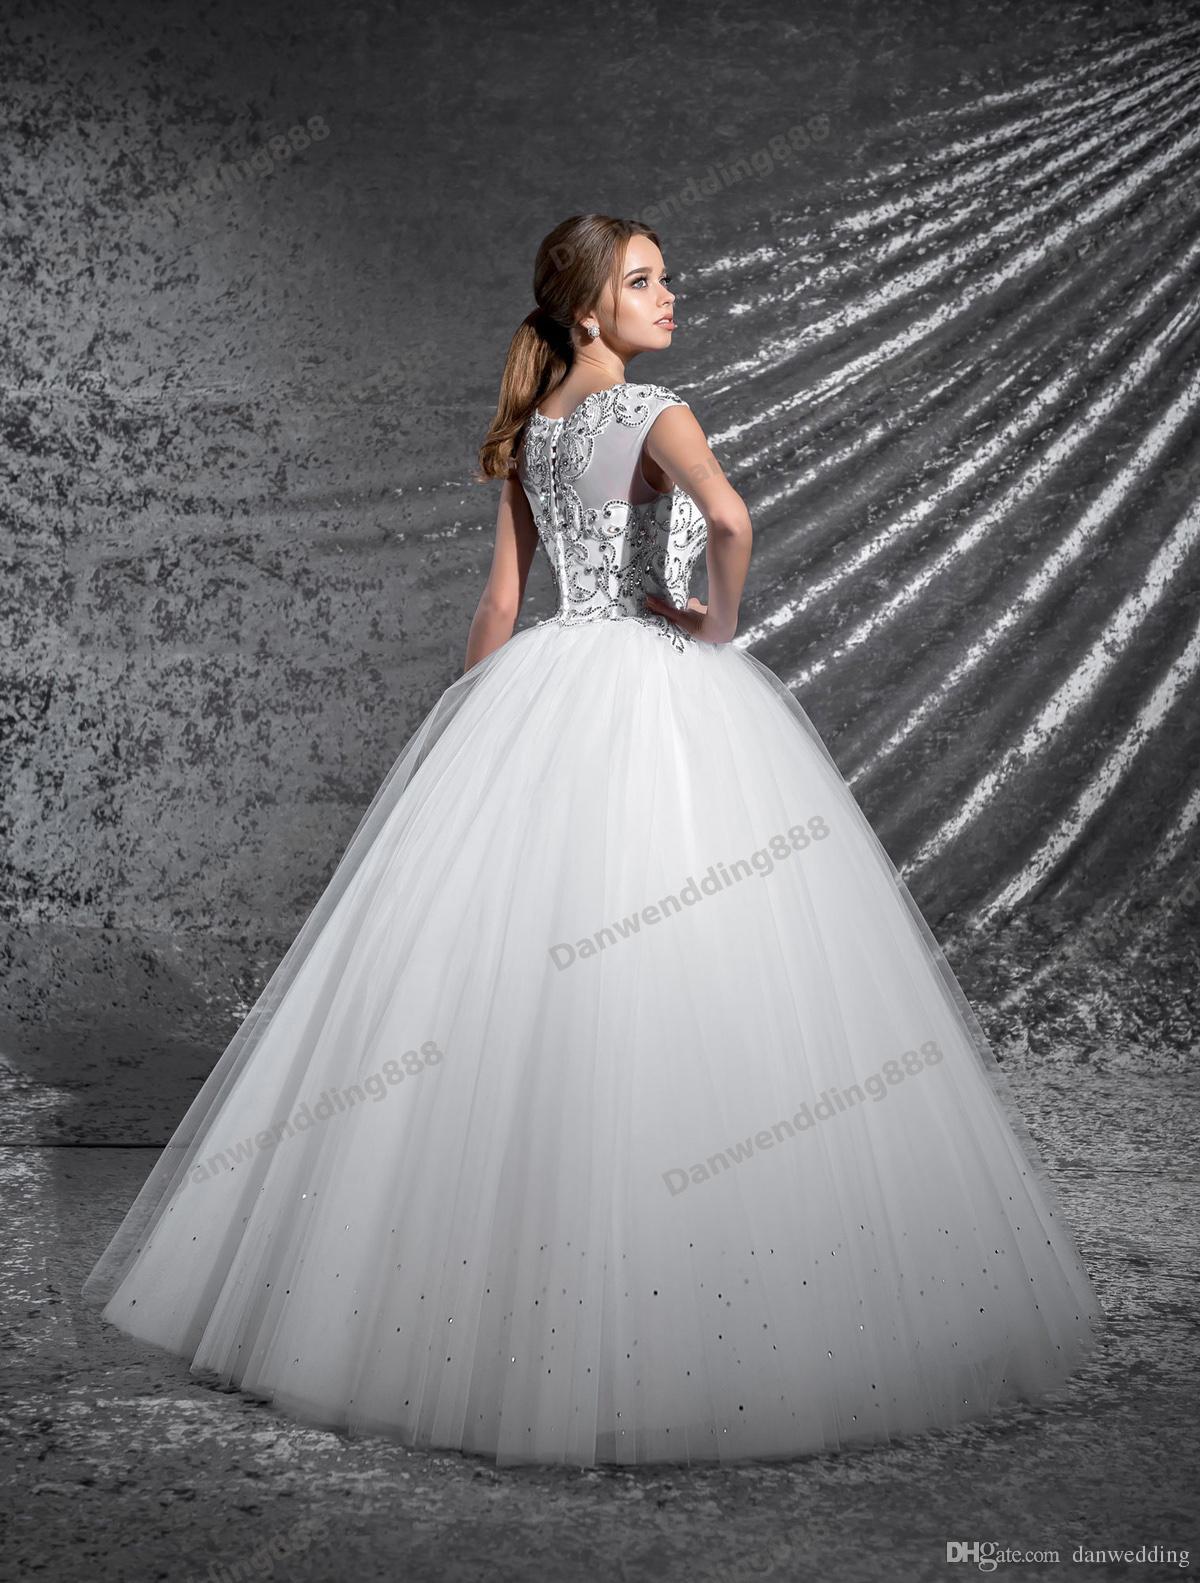 Grace White Tulle Scoop Applique Beads A-Line Wedding Dresses Bridal Pageant Dresses Wedding Attire Dresses Custom Size 2-16 ZW606017